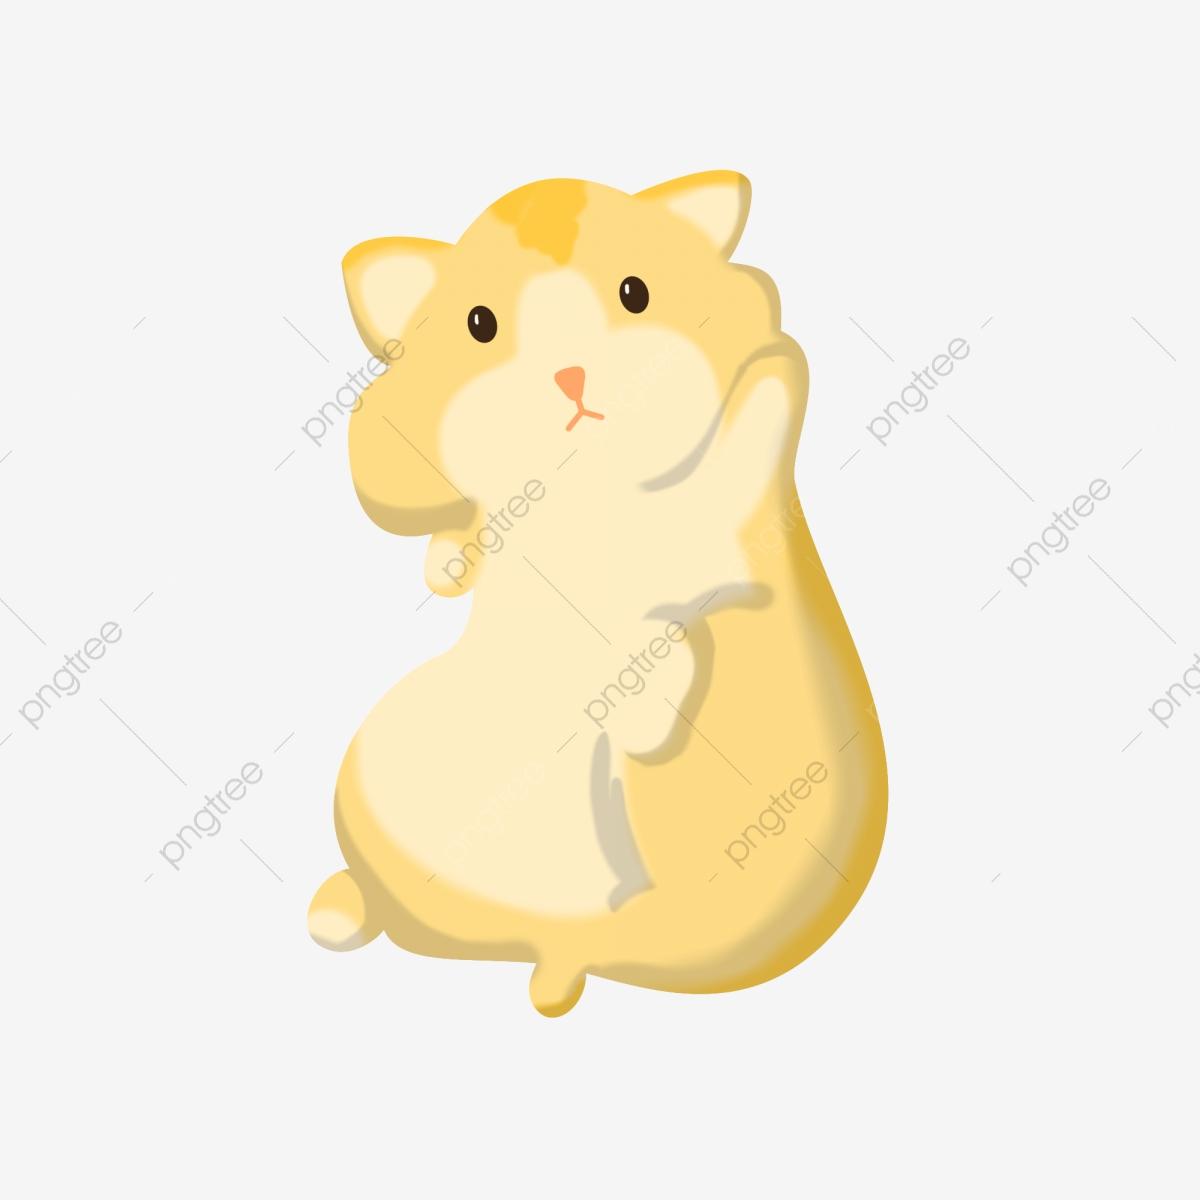 Hamster clipart hamster cartoon. Little mouse background mini